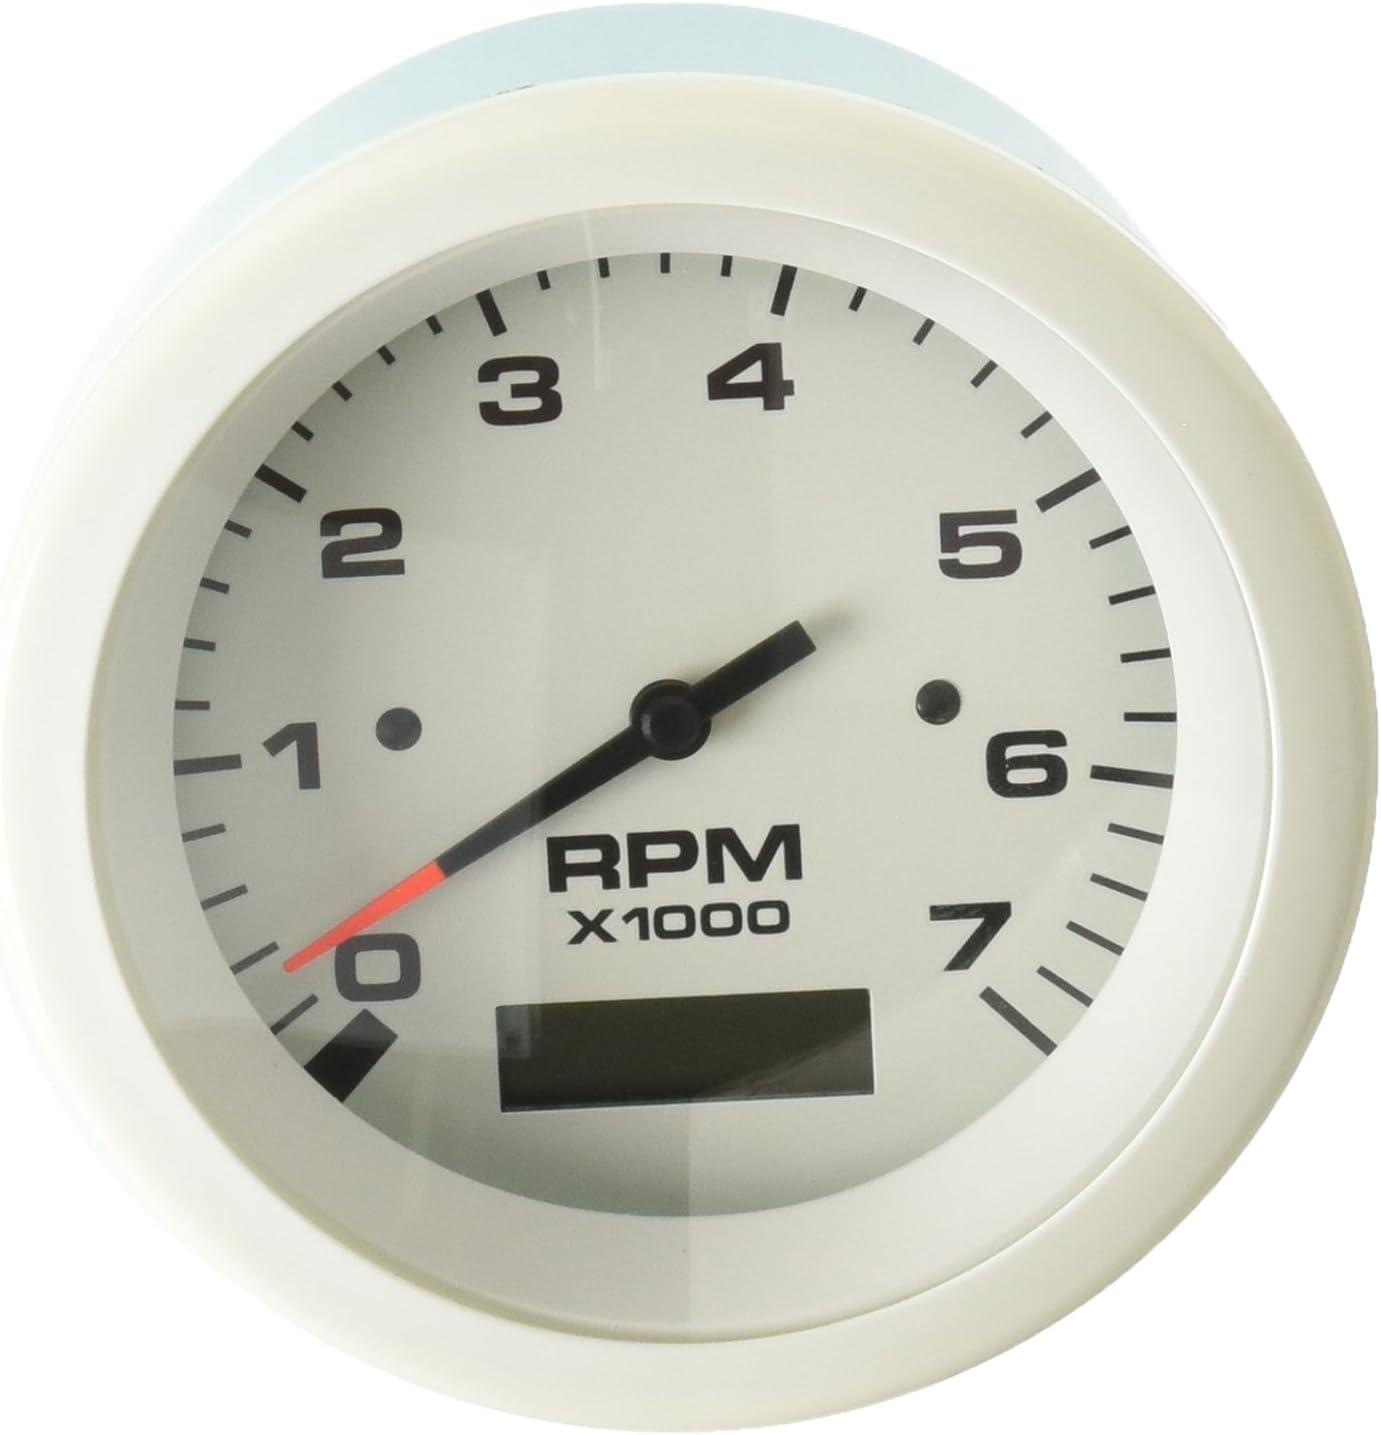 Sierra International 69044P 0-7000 RPM Dial Range Amega Domed Electric Tachometer for Force Engines 3 3 Teleflex